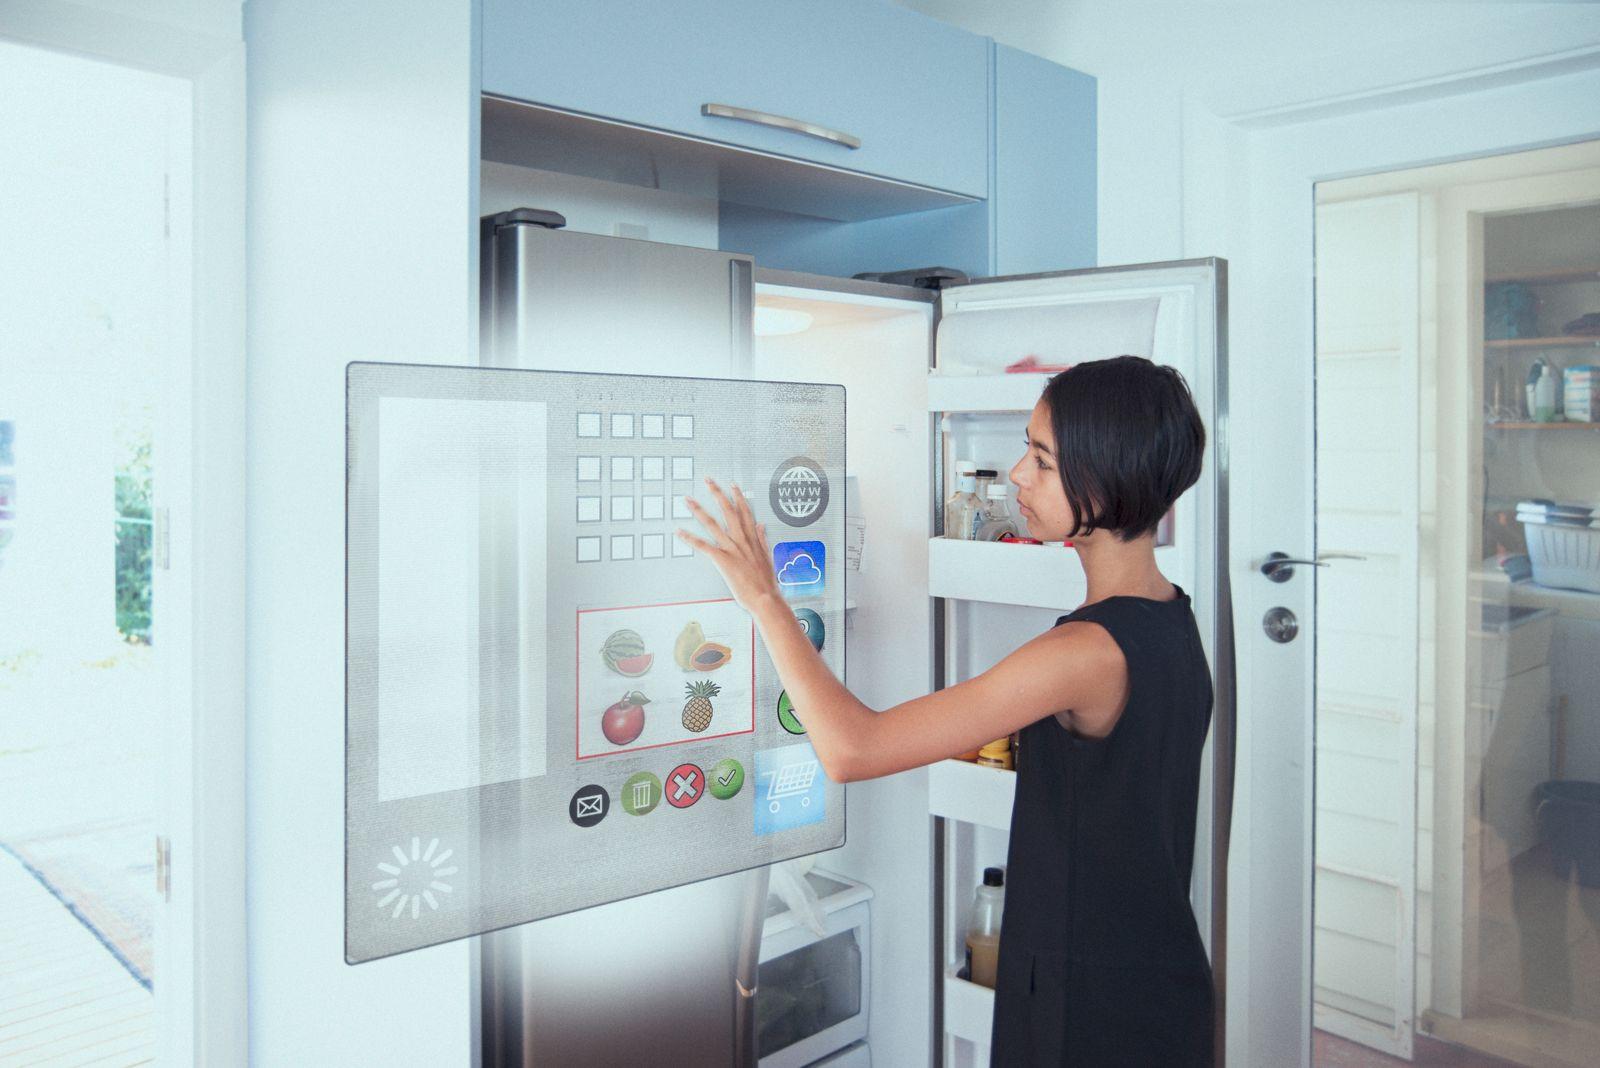 EINMALIGE VERWENDUNG Digitalisierung / IOT / Internet of things / Kühlschrank